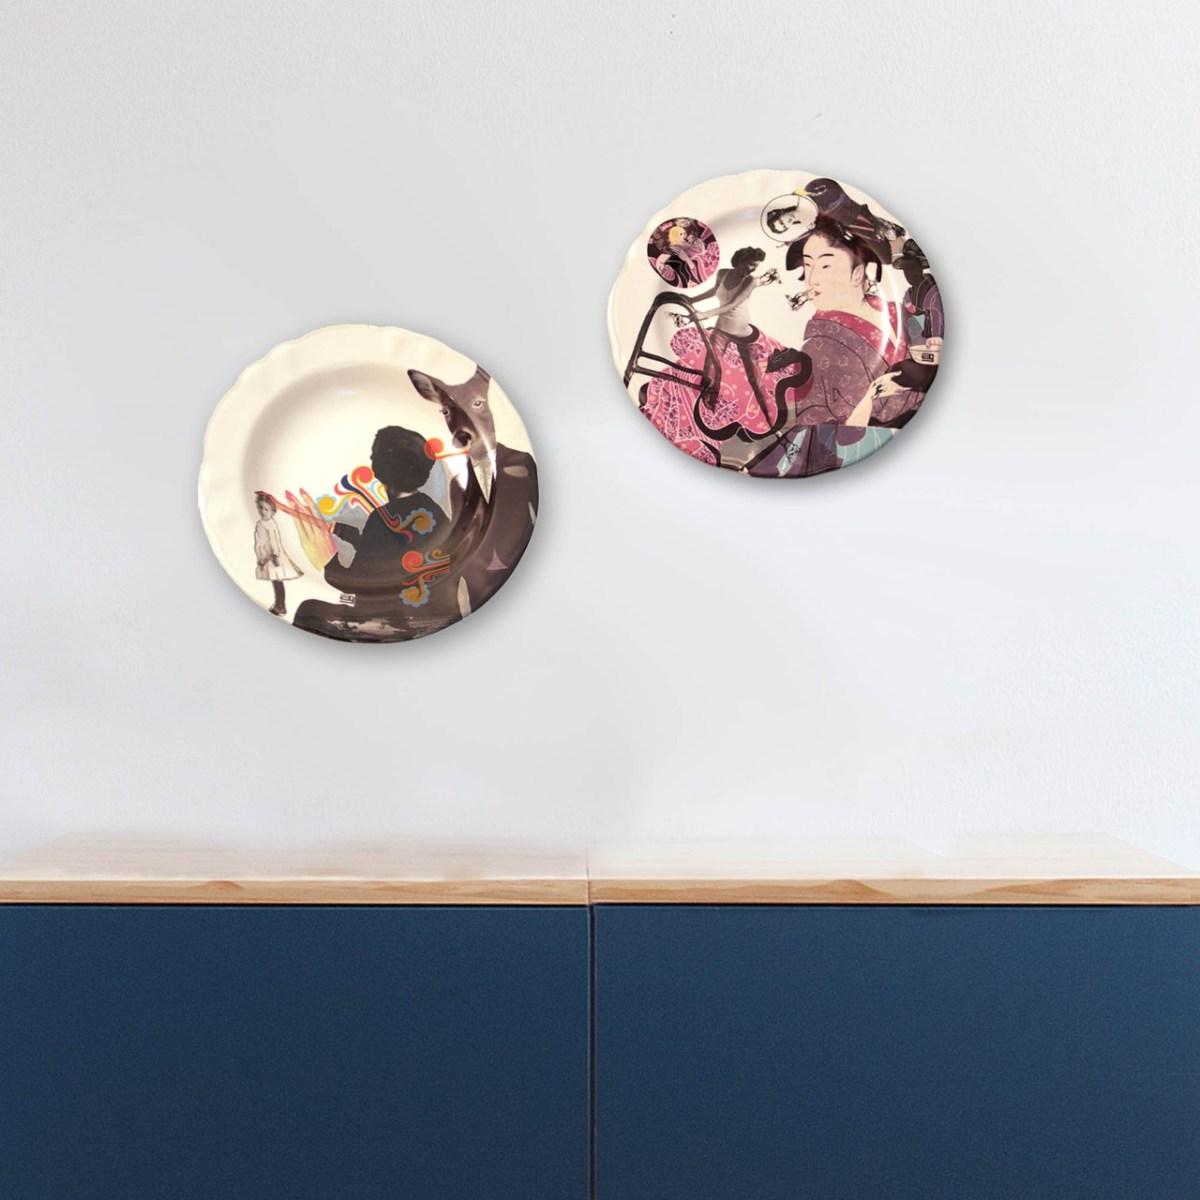 Montaje de obras de la ceramista Ana Gomez